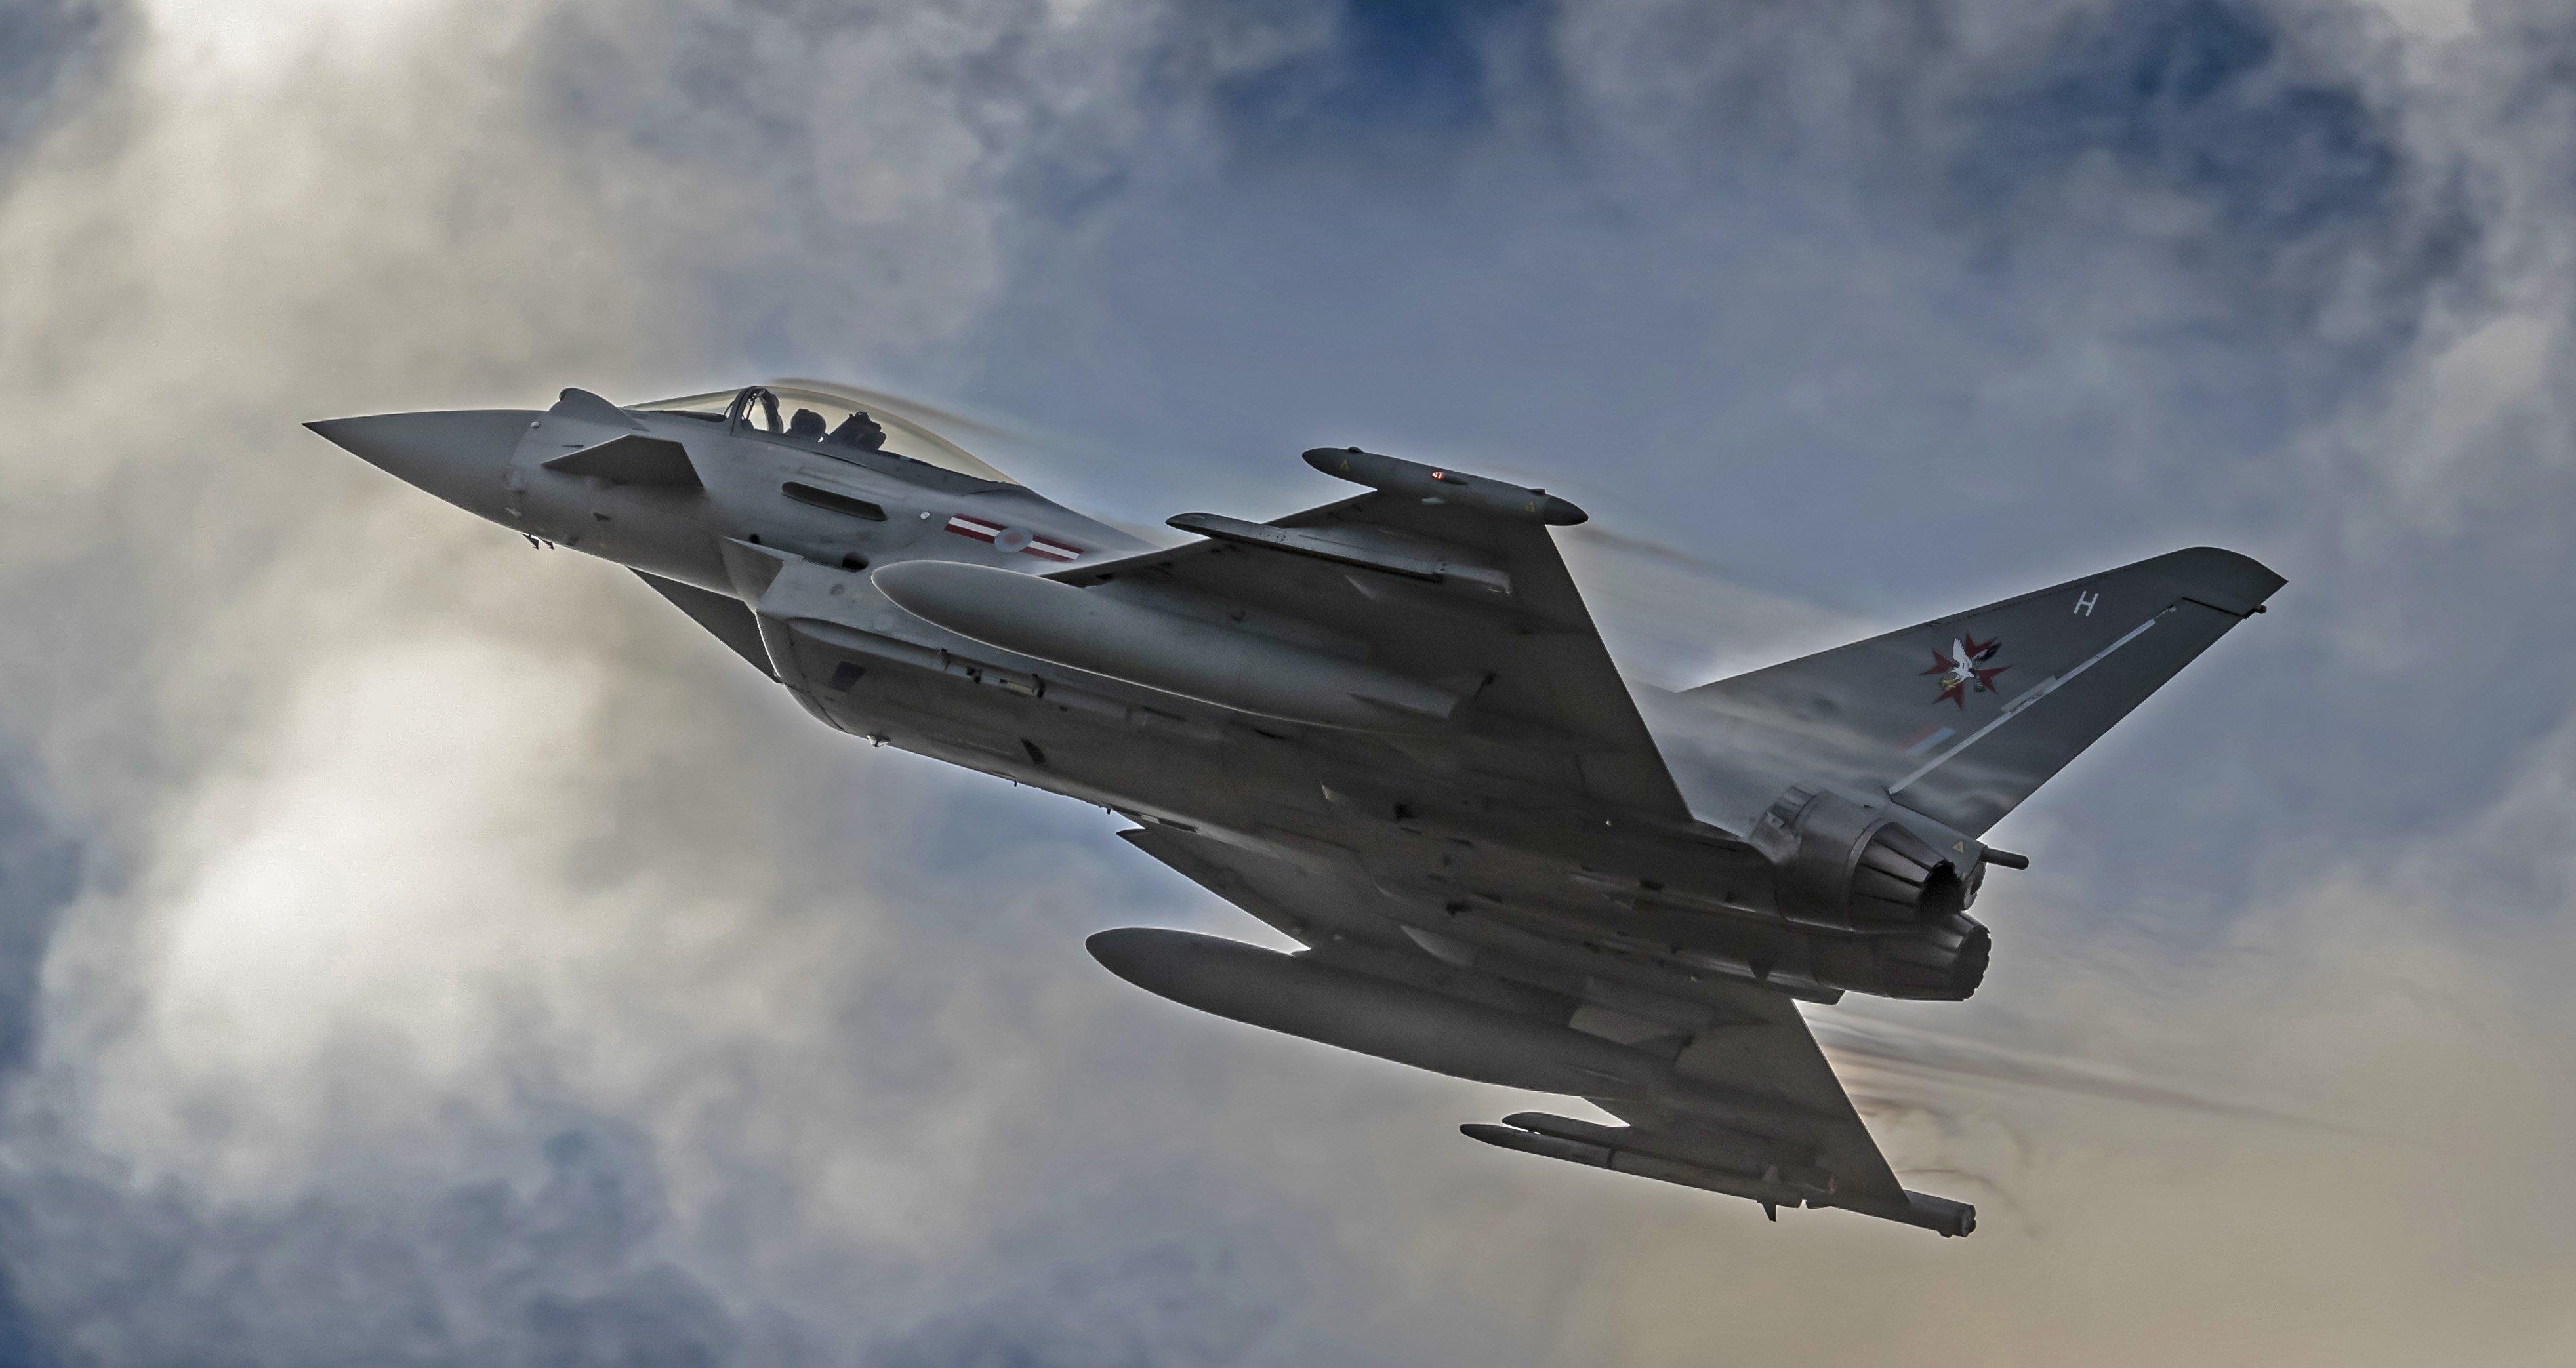 Eurofighter Typhoon FGR4 [MoD Crown Copyright/Sgt Dave Rose]